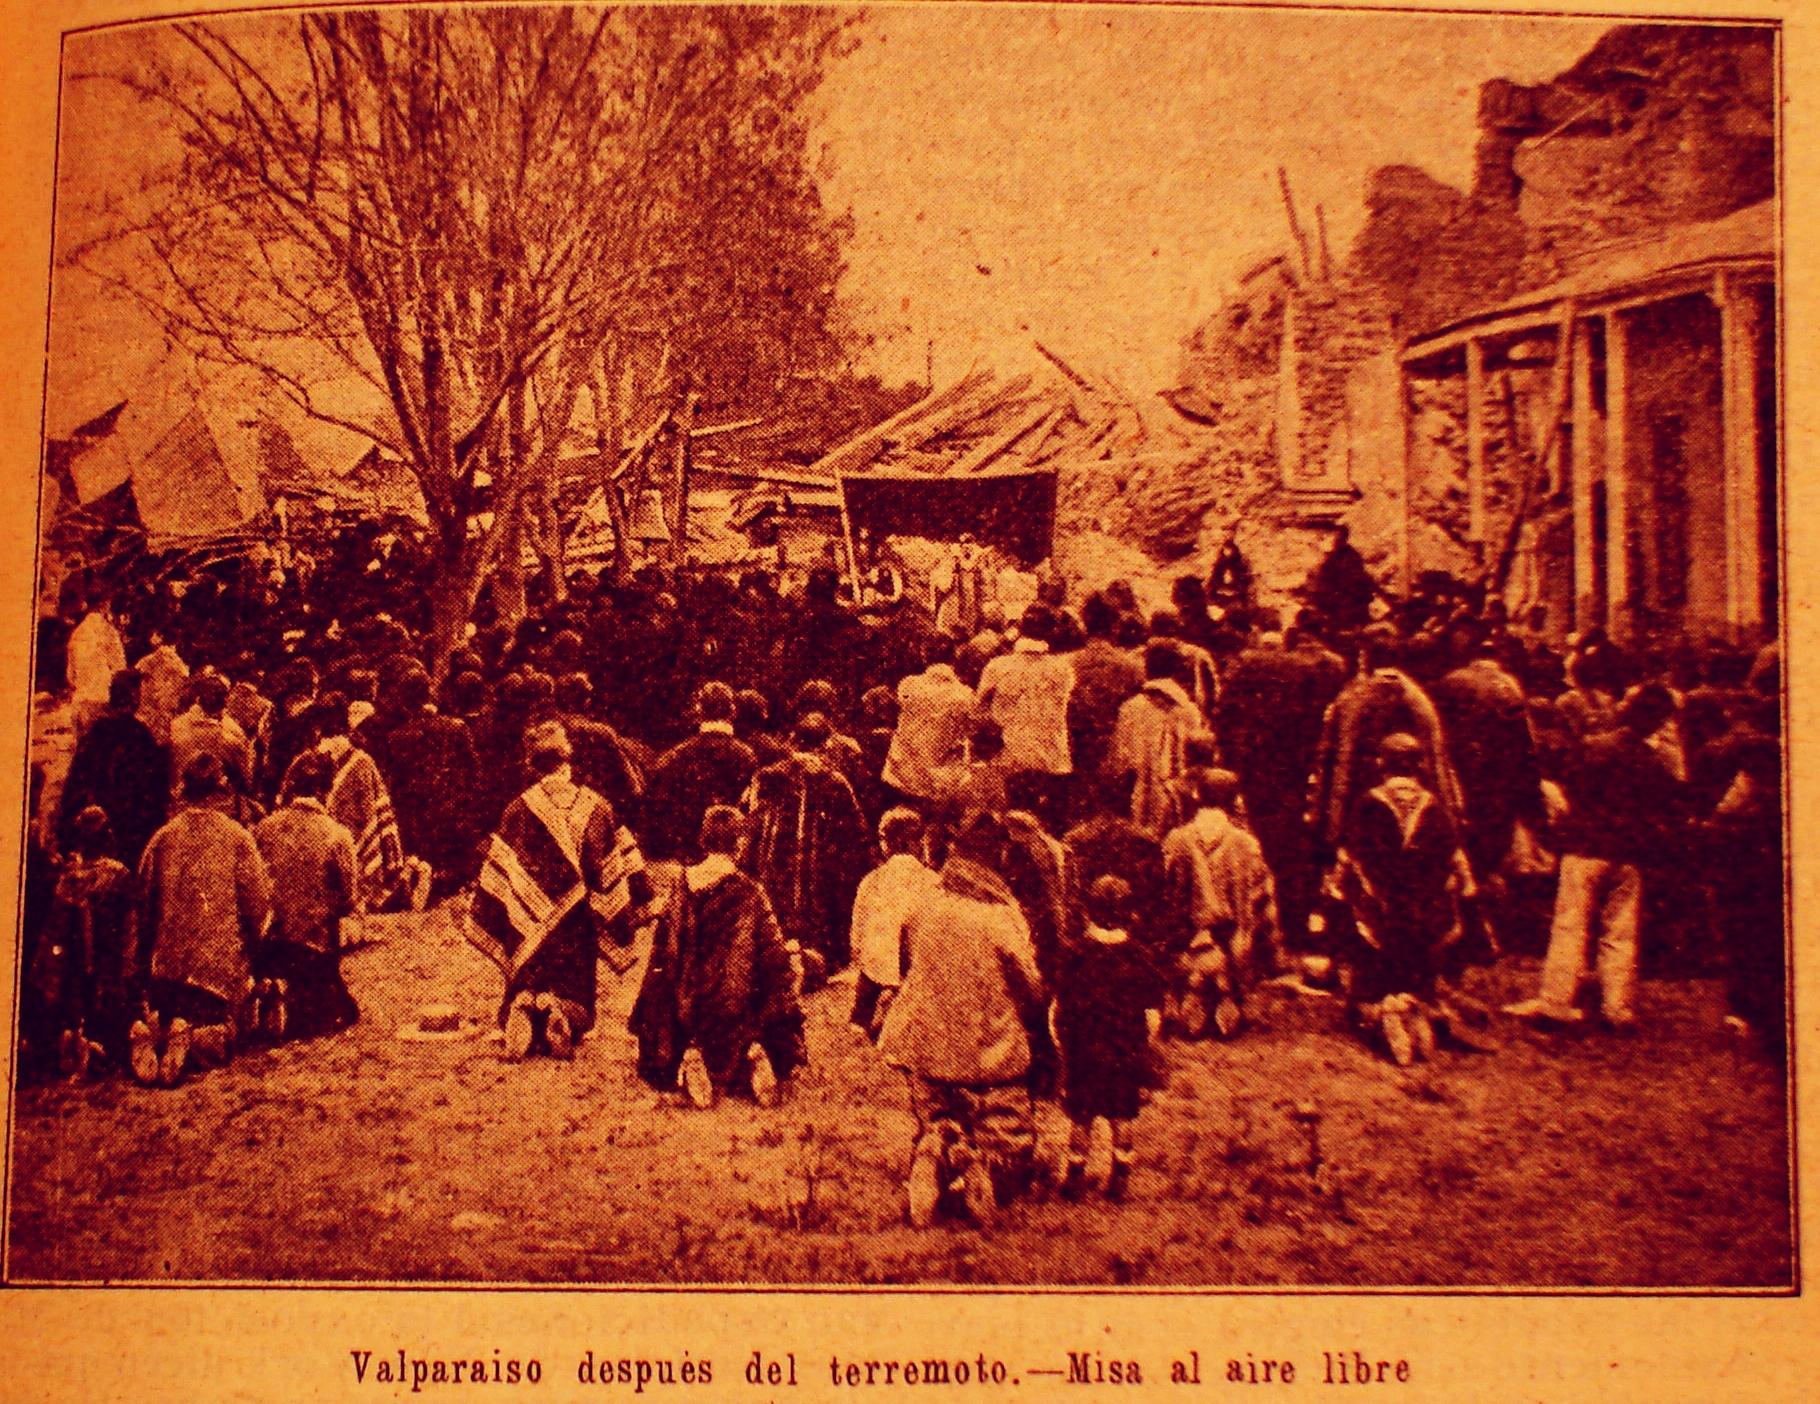 Description Terremoto de valparaiso 1906.jpg